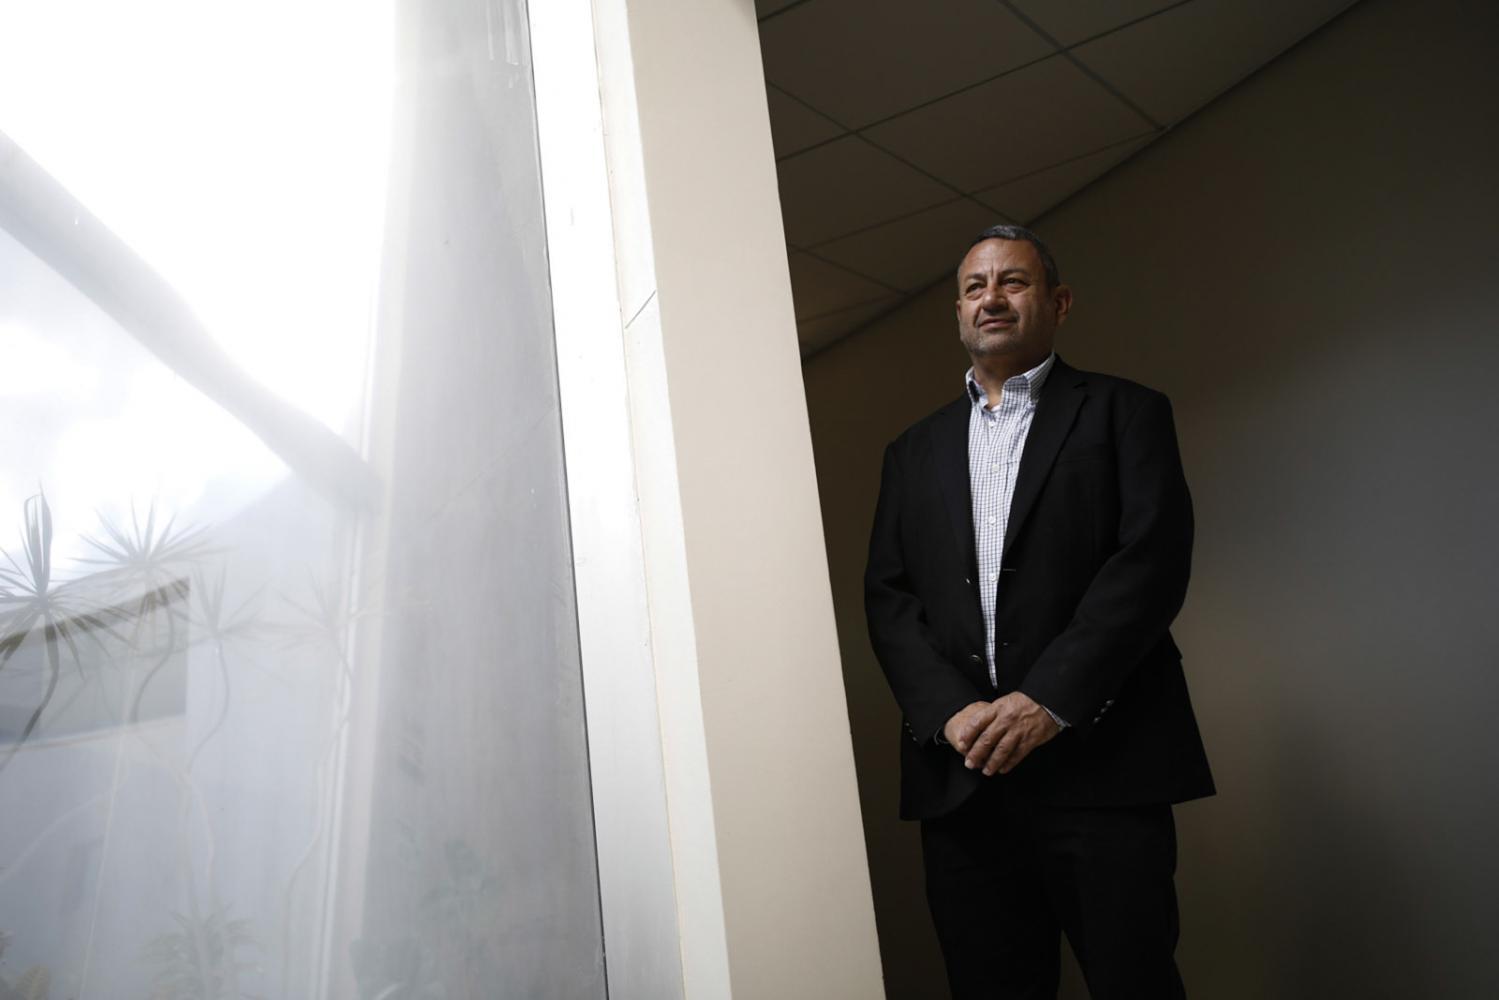 Professor Dan G. Blumberg, Vizepräsident im Bereich 'Research and Development', an der Ben-Gurion University of the Negev in Beersheva, Israel, 21.Februar 2017.